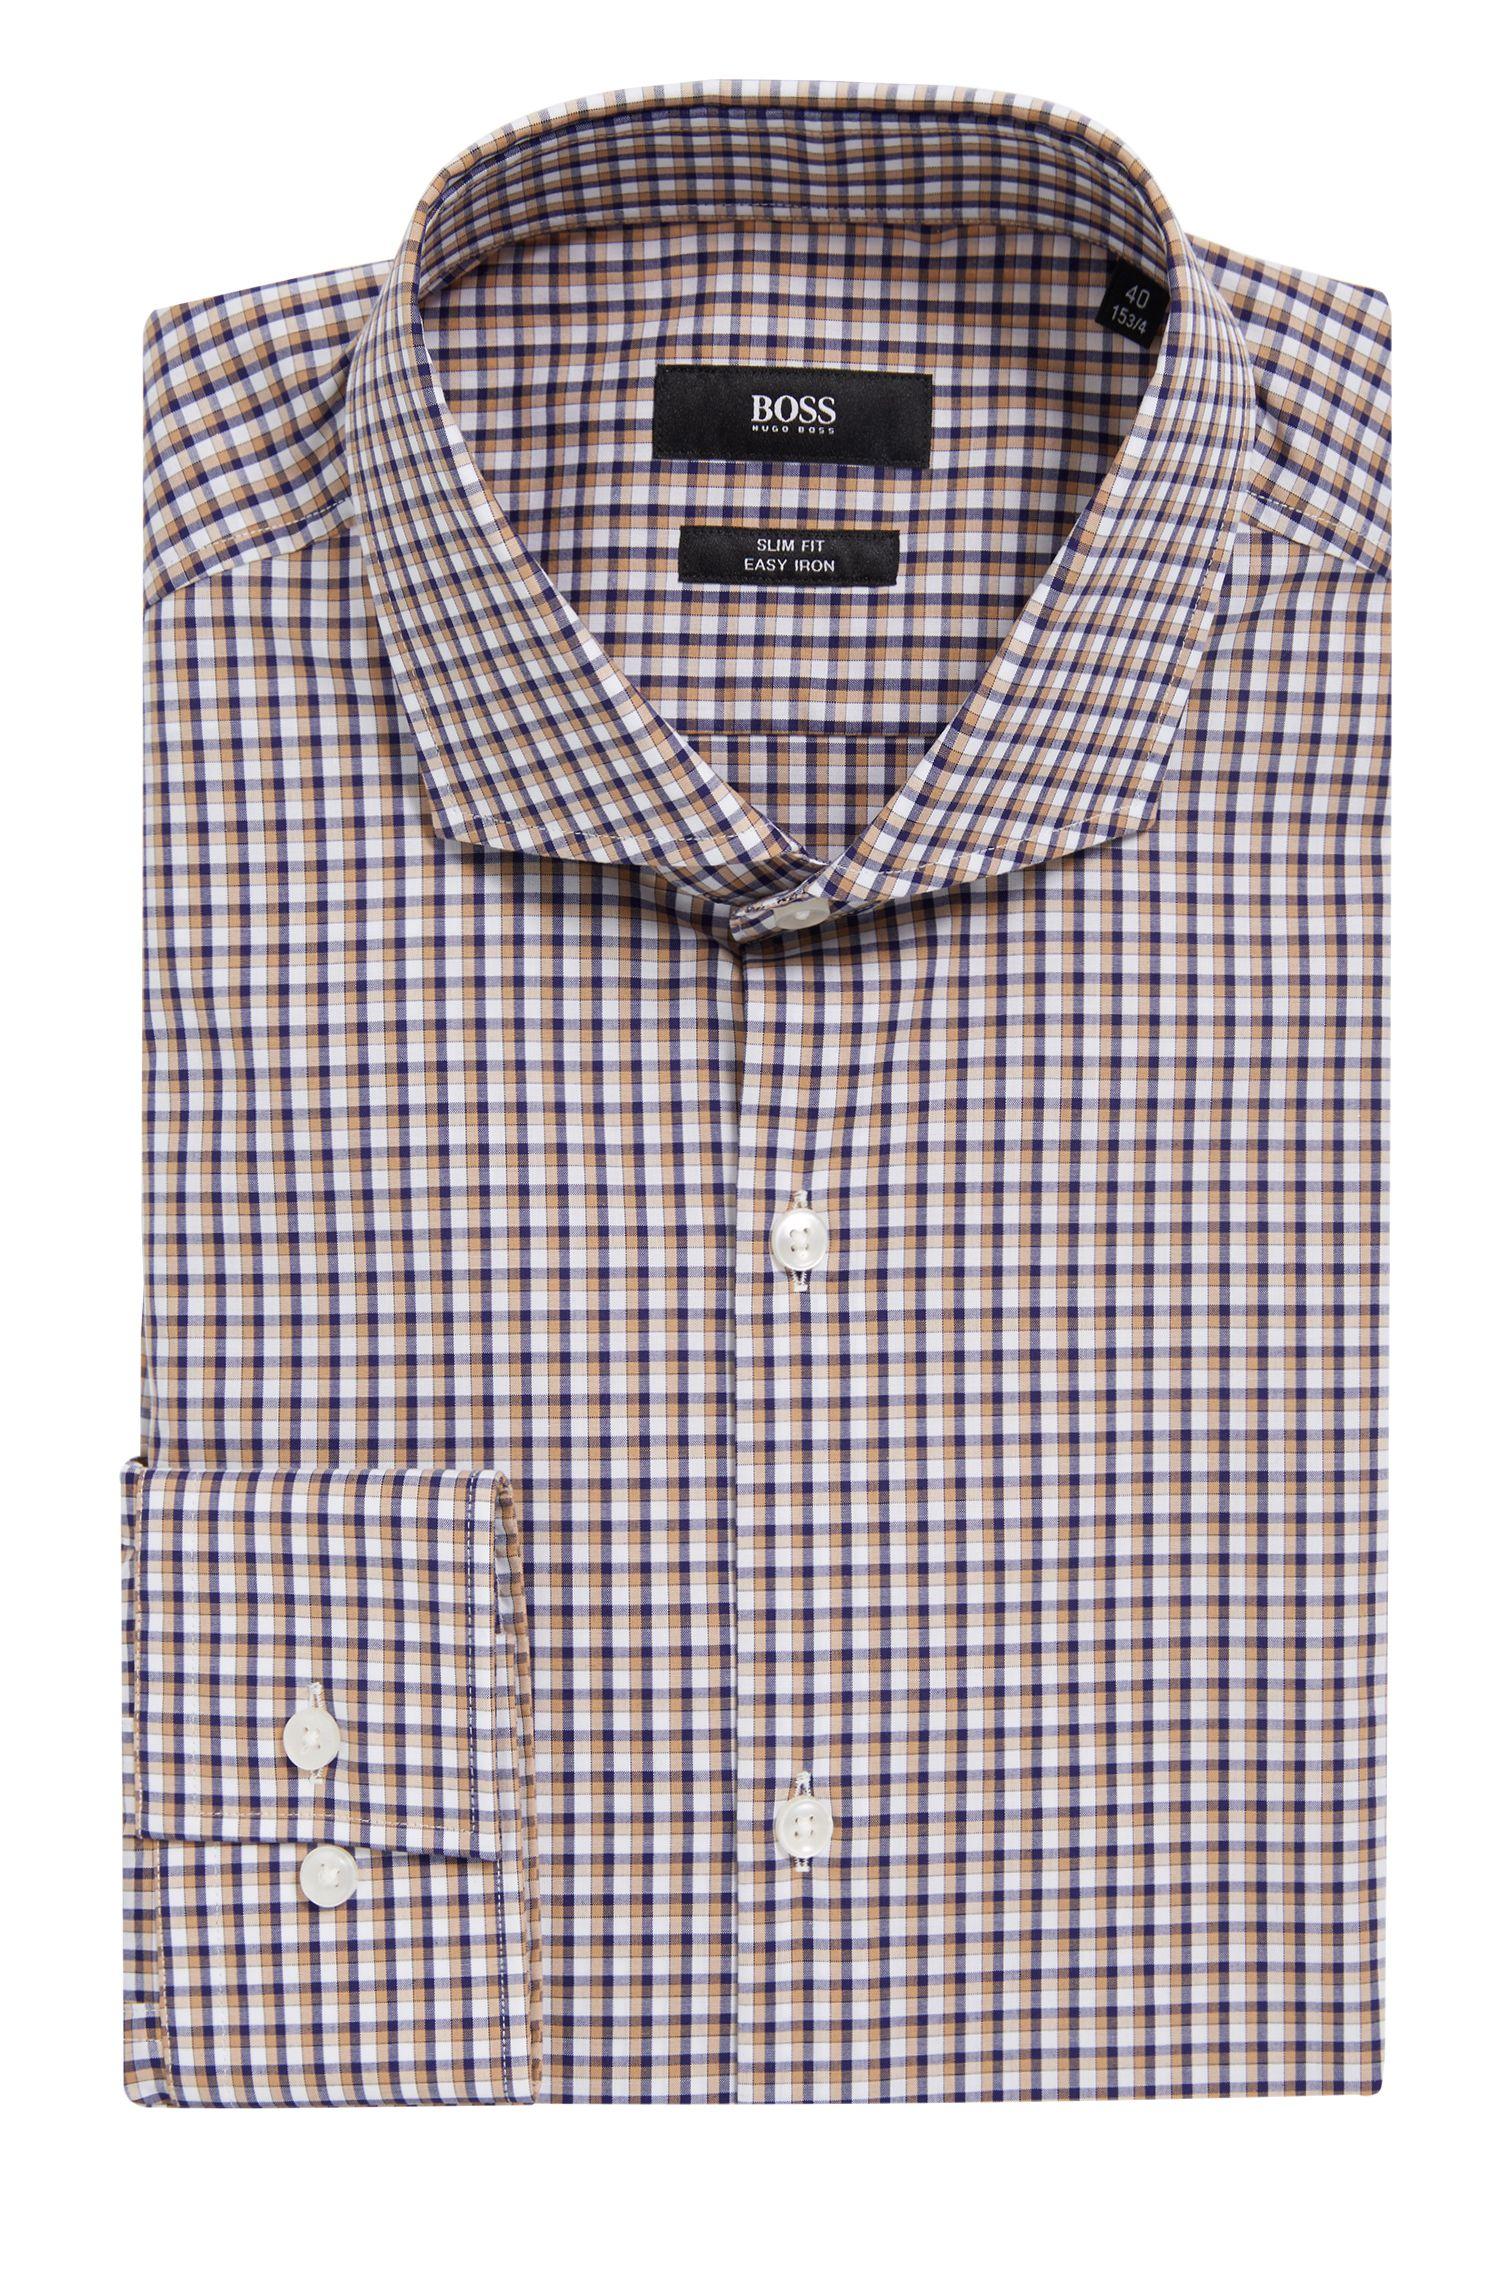 Checked Easy Iron Slim Fit Cotton Dress Shirt, Slim Fit | Jason